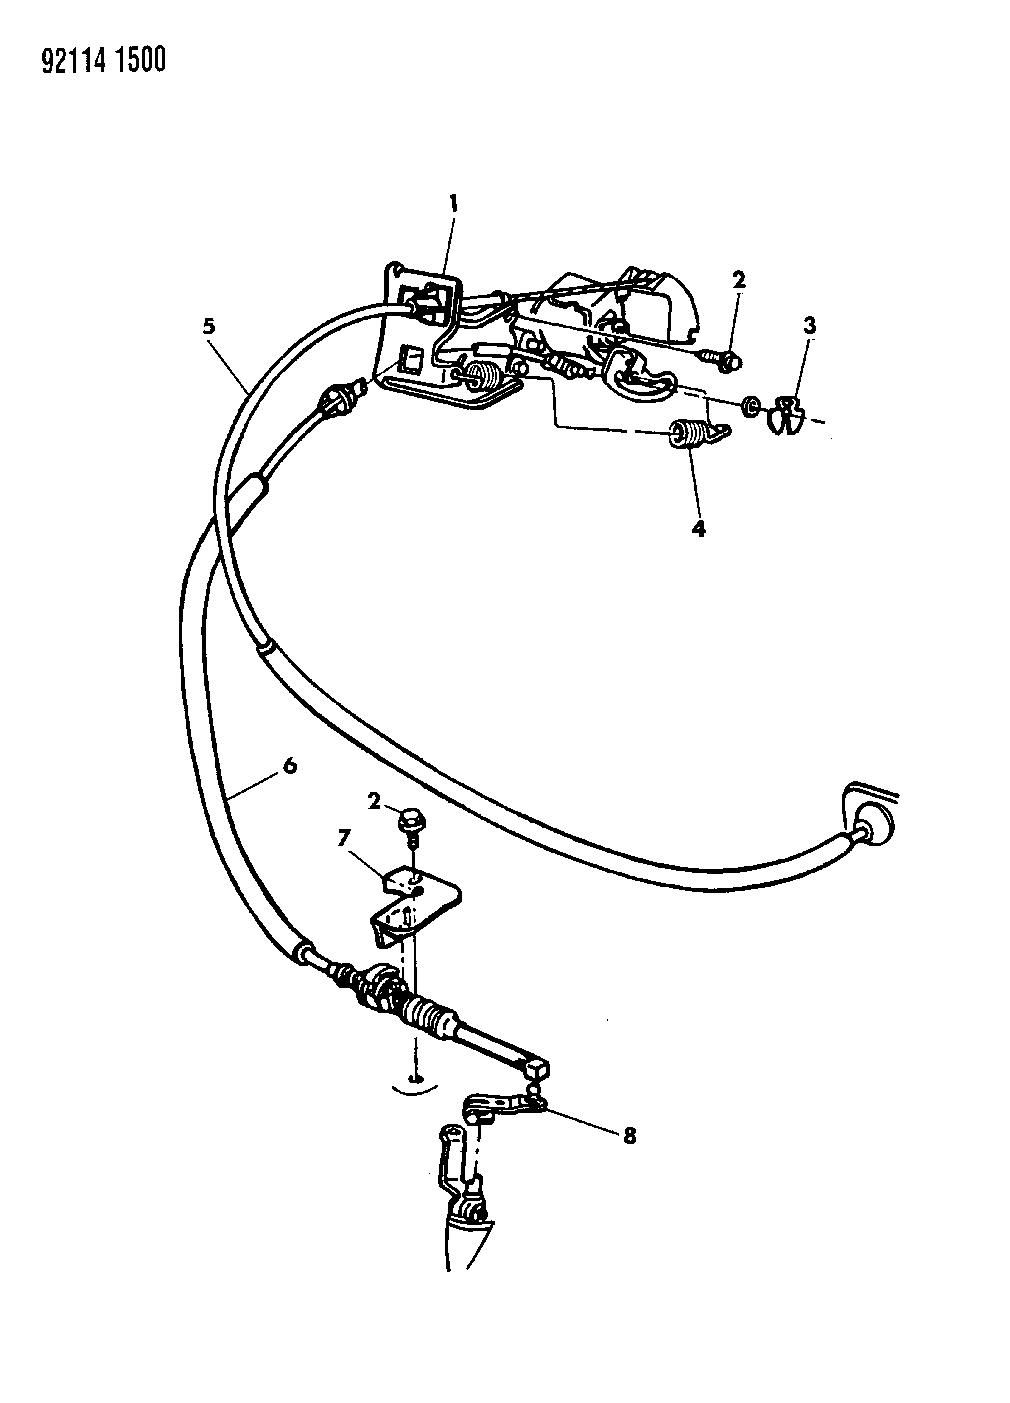 1992 Dodge Shadow Throttle Control Mopar Parts Giant Wiring Diagram Thumbnail 1